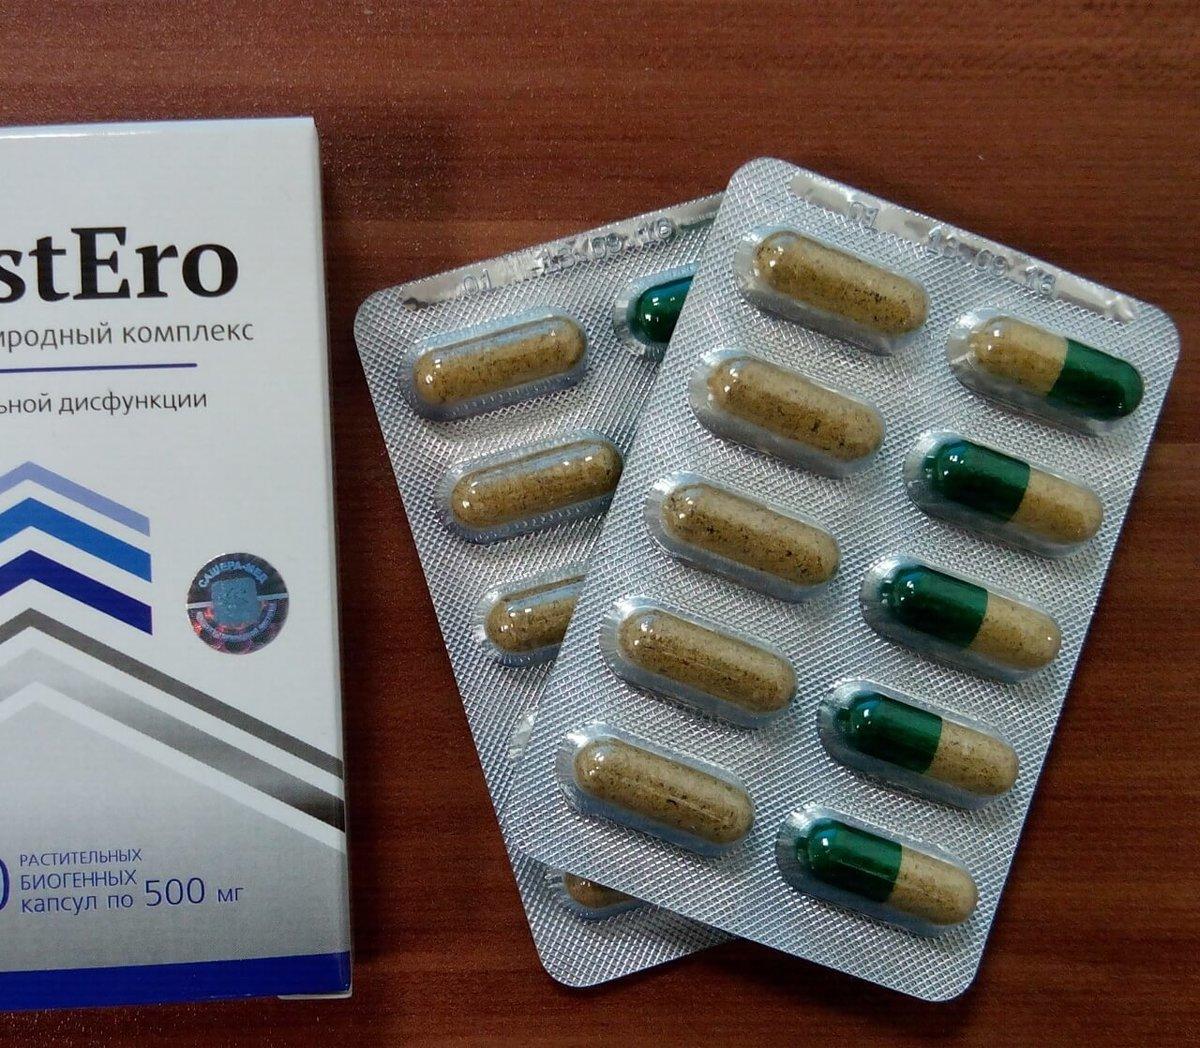 лекарства от простатита у мужчин список цена